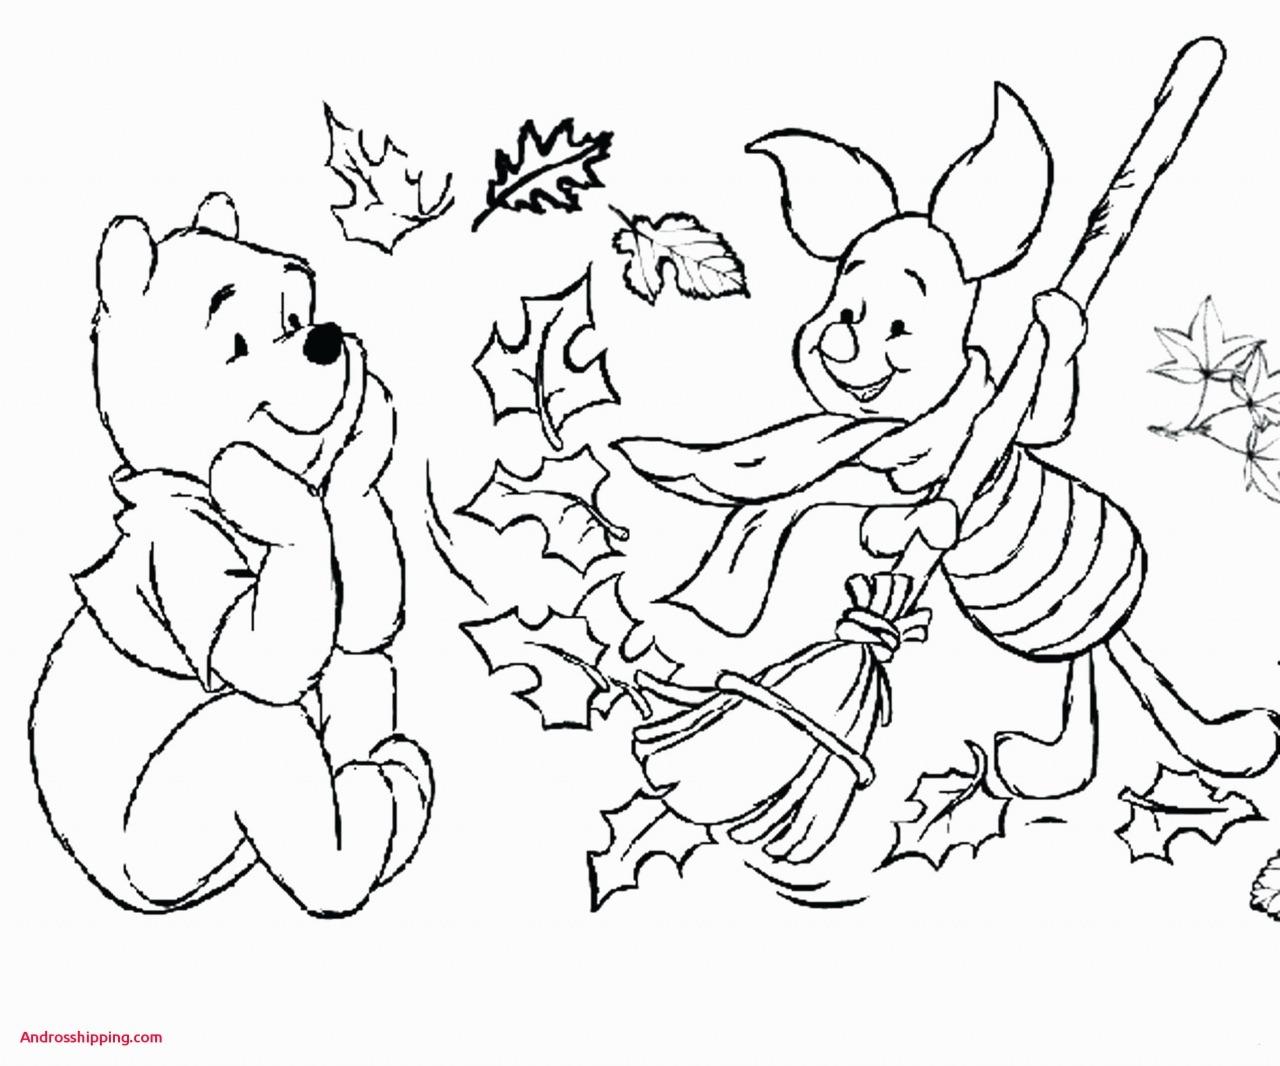 Jojo Siwa Coloring Pages Mini Coloring Beautiful Image 10 Awesome